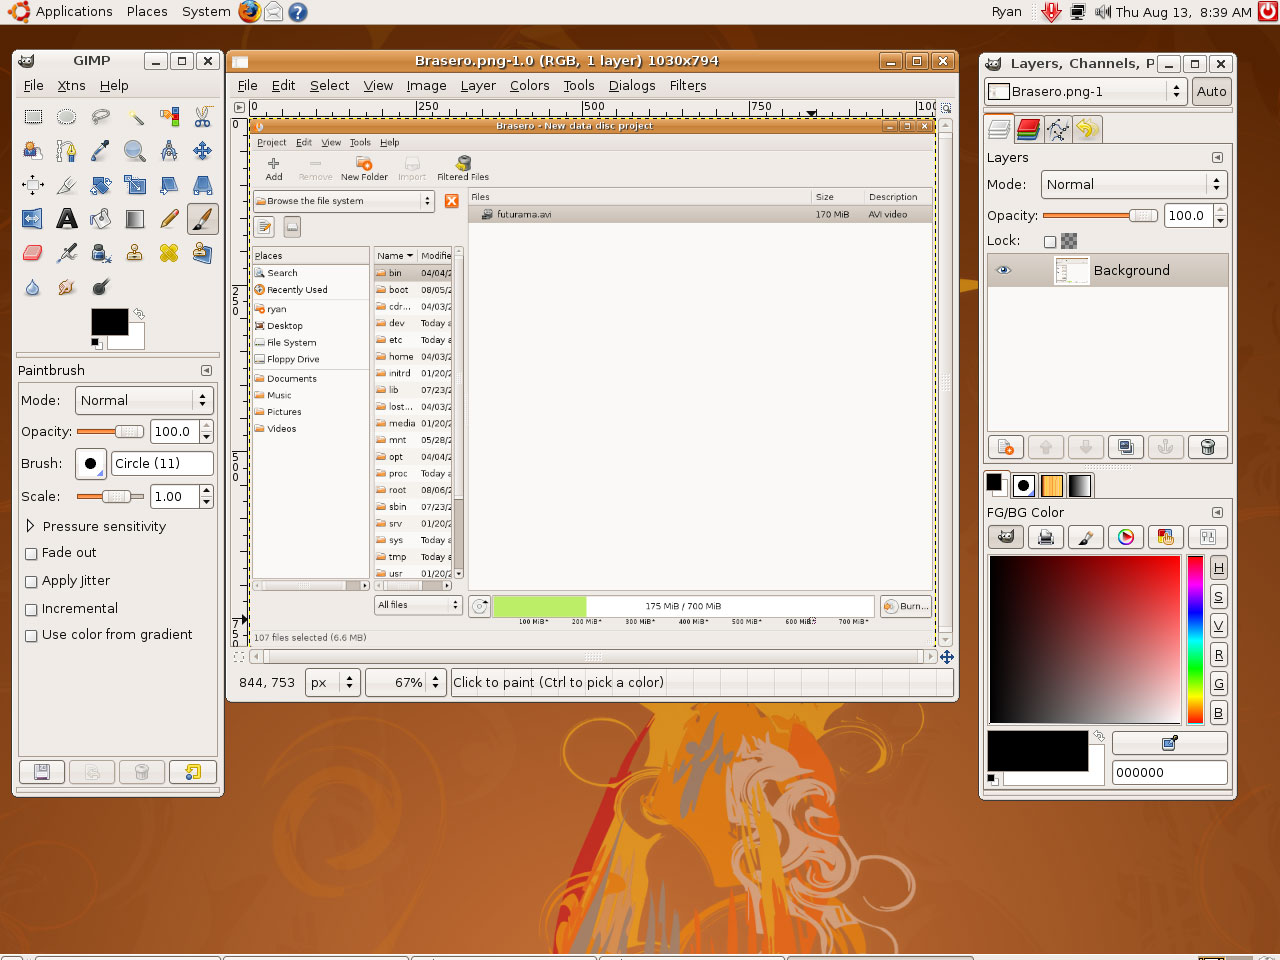 Applications Cd Burning Image Editing Revisiting Linux